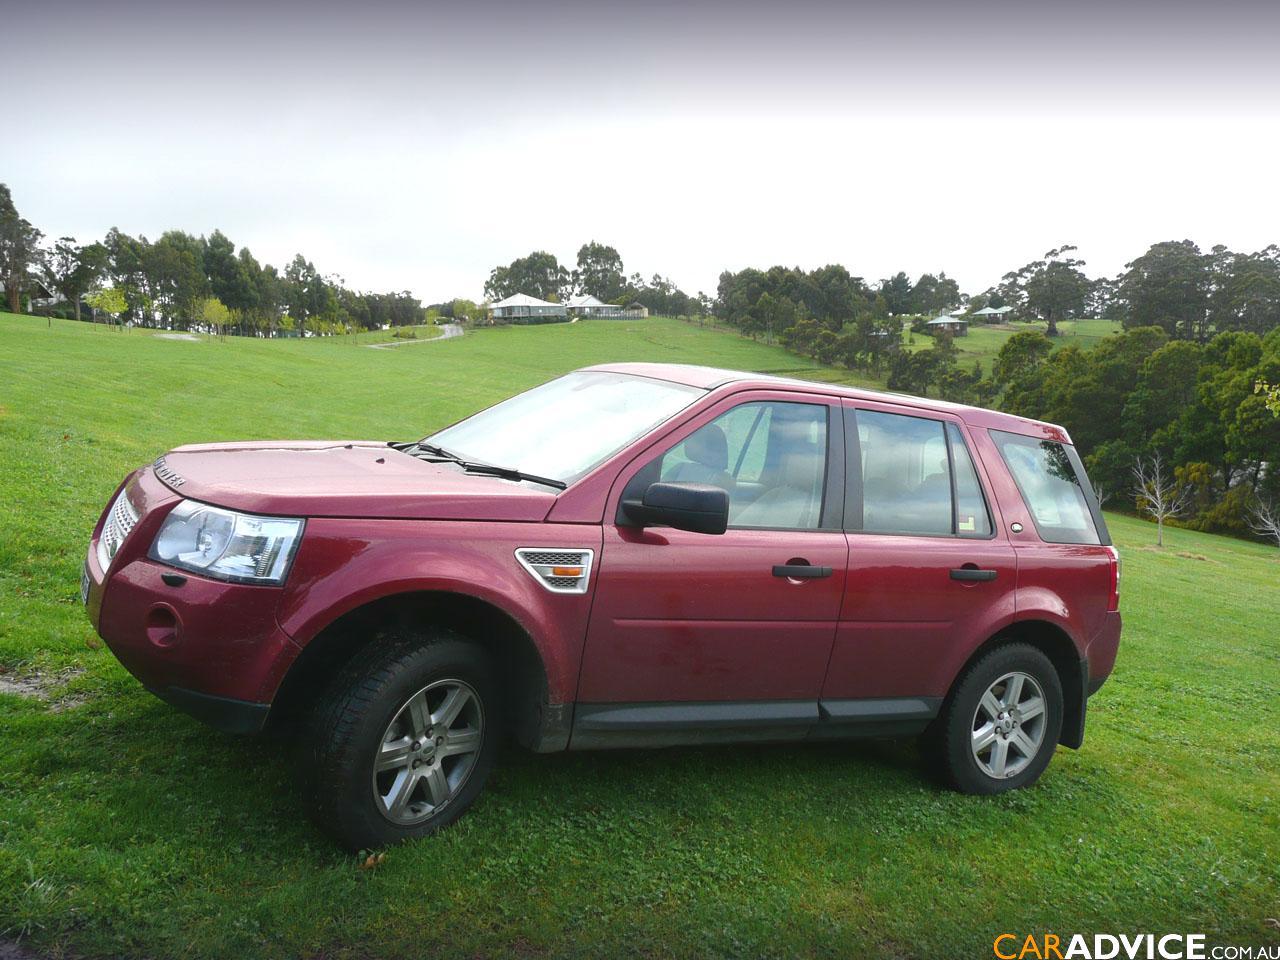 2007 Land Rover Freelander 2 review | CarAdvice